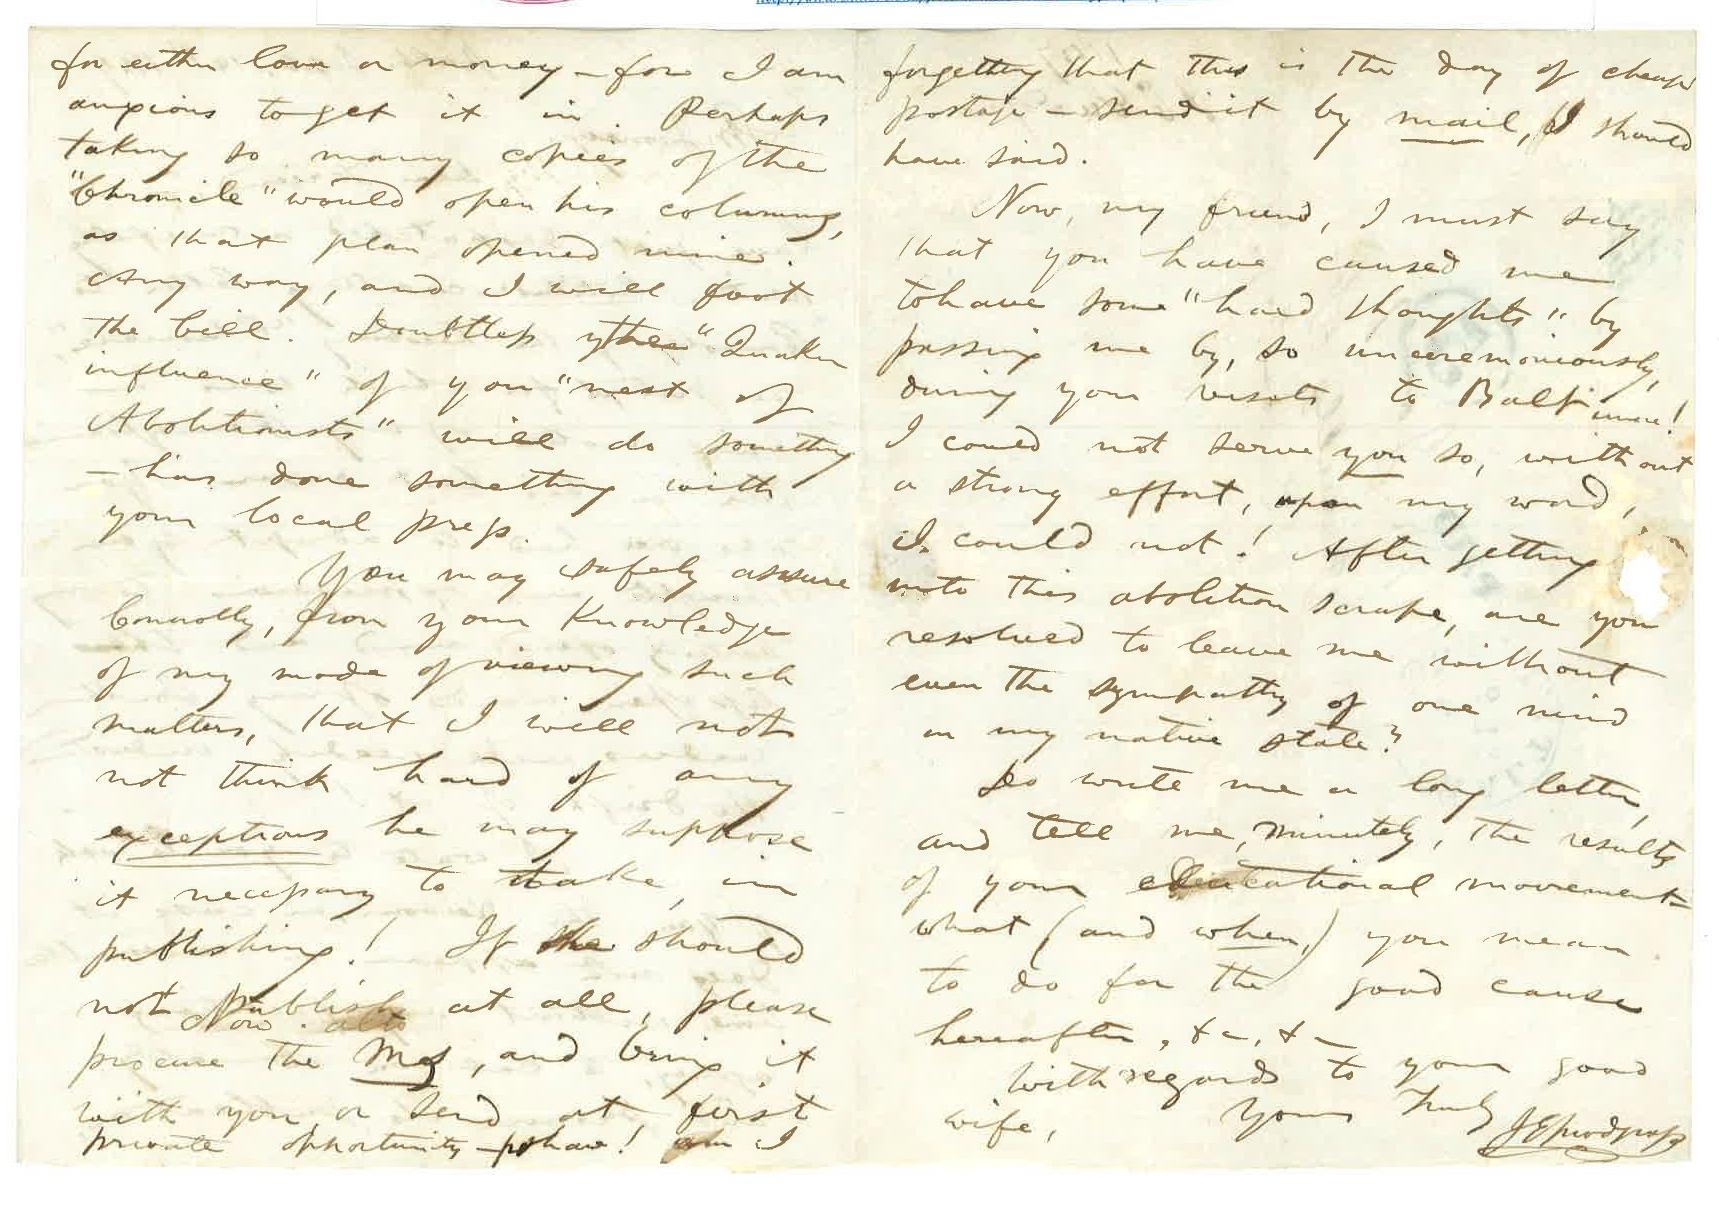 snodgrass-to-janney-1847-pg-2.jpg